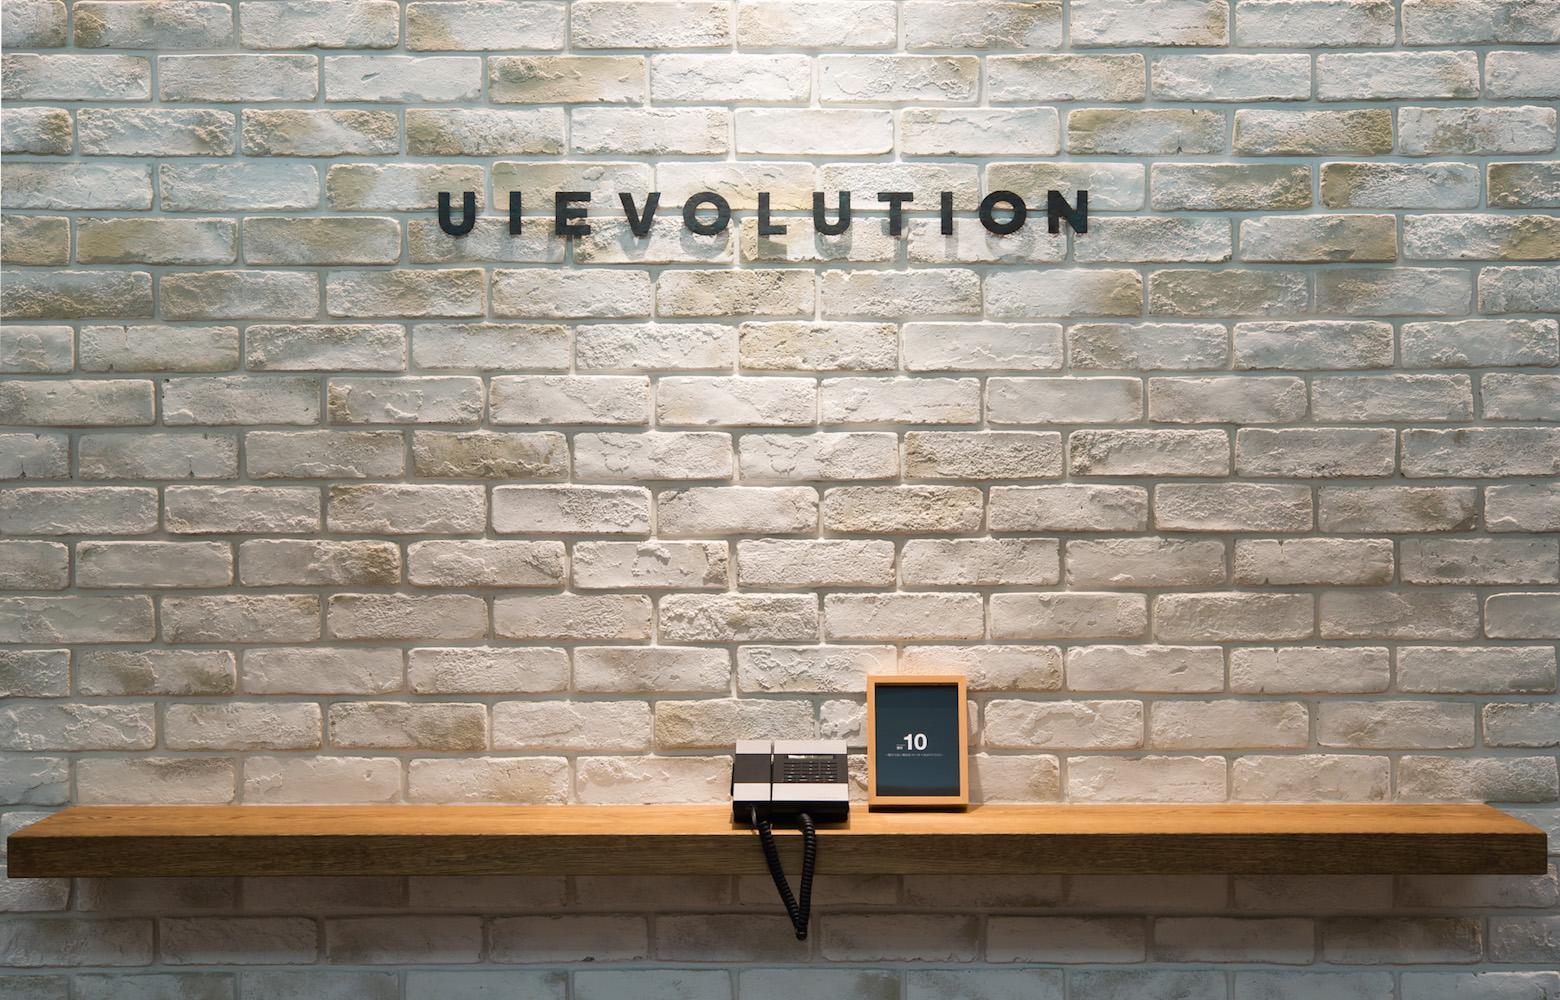 UIEvolution株式会社 vol.1 Entrance_2 デザイン・レイアウト事例